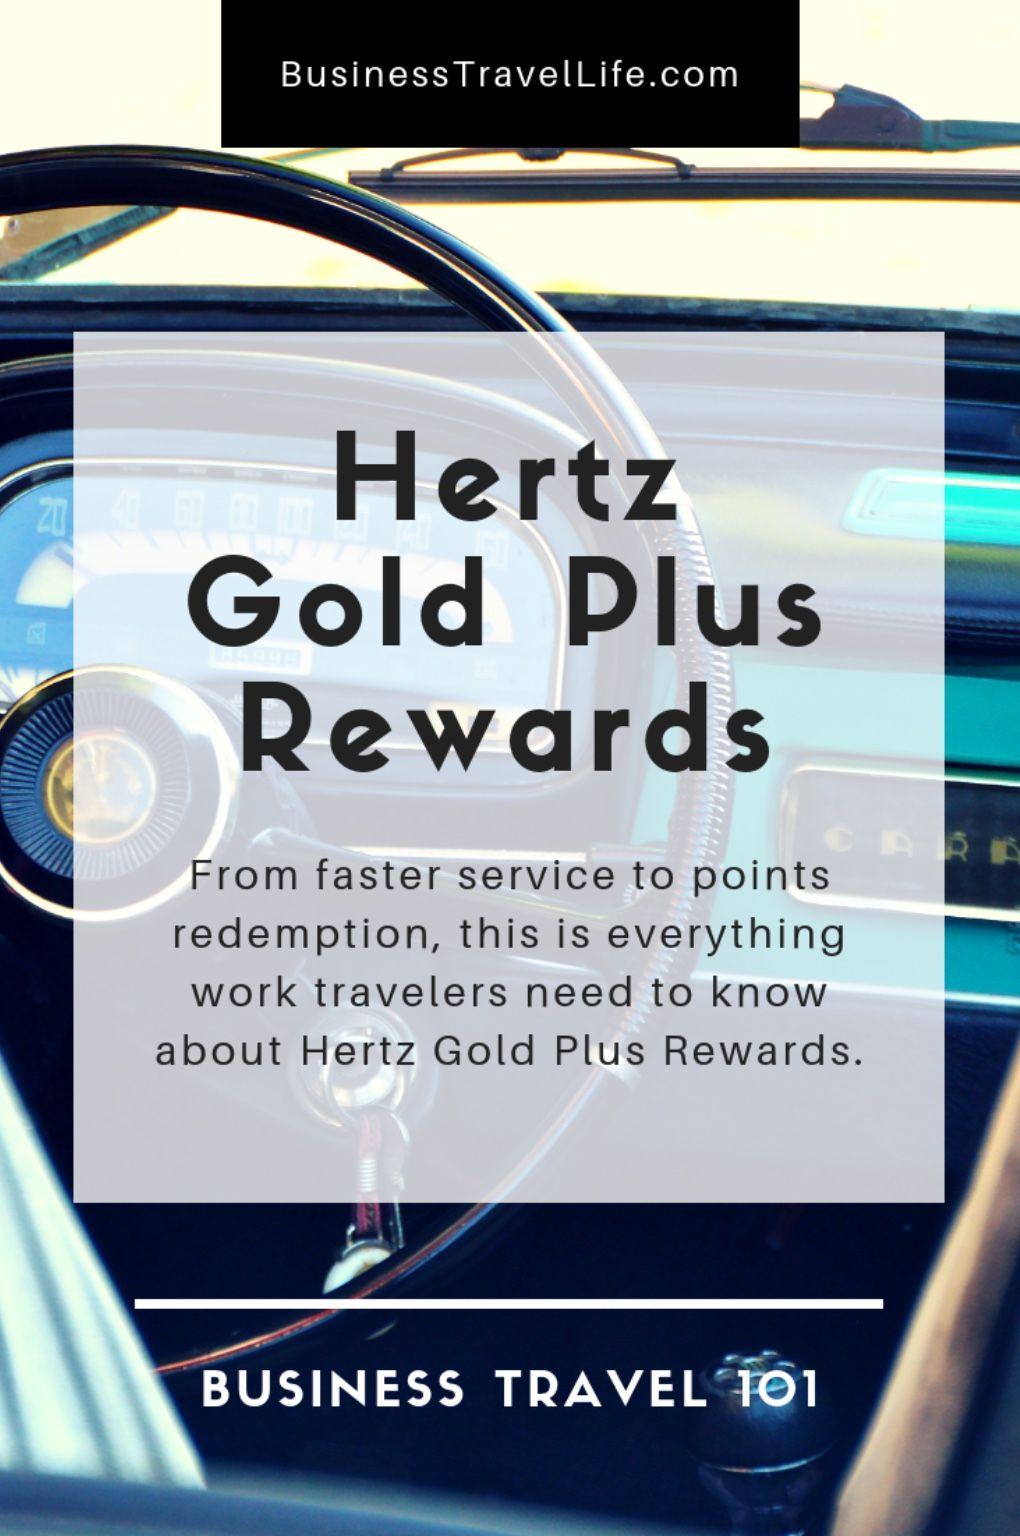 Business Travel 101 Hertz Gold Plus Rewards Business Travel